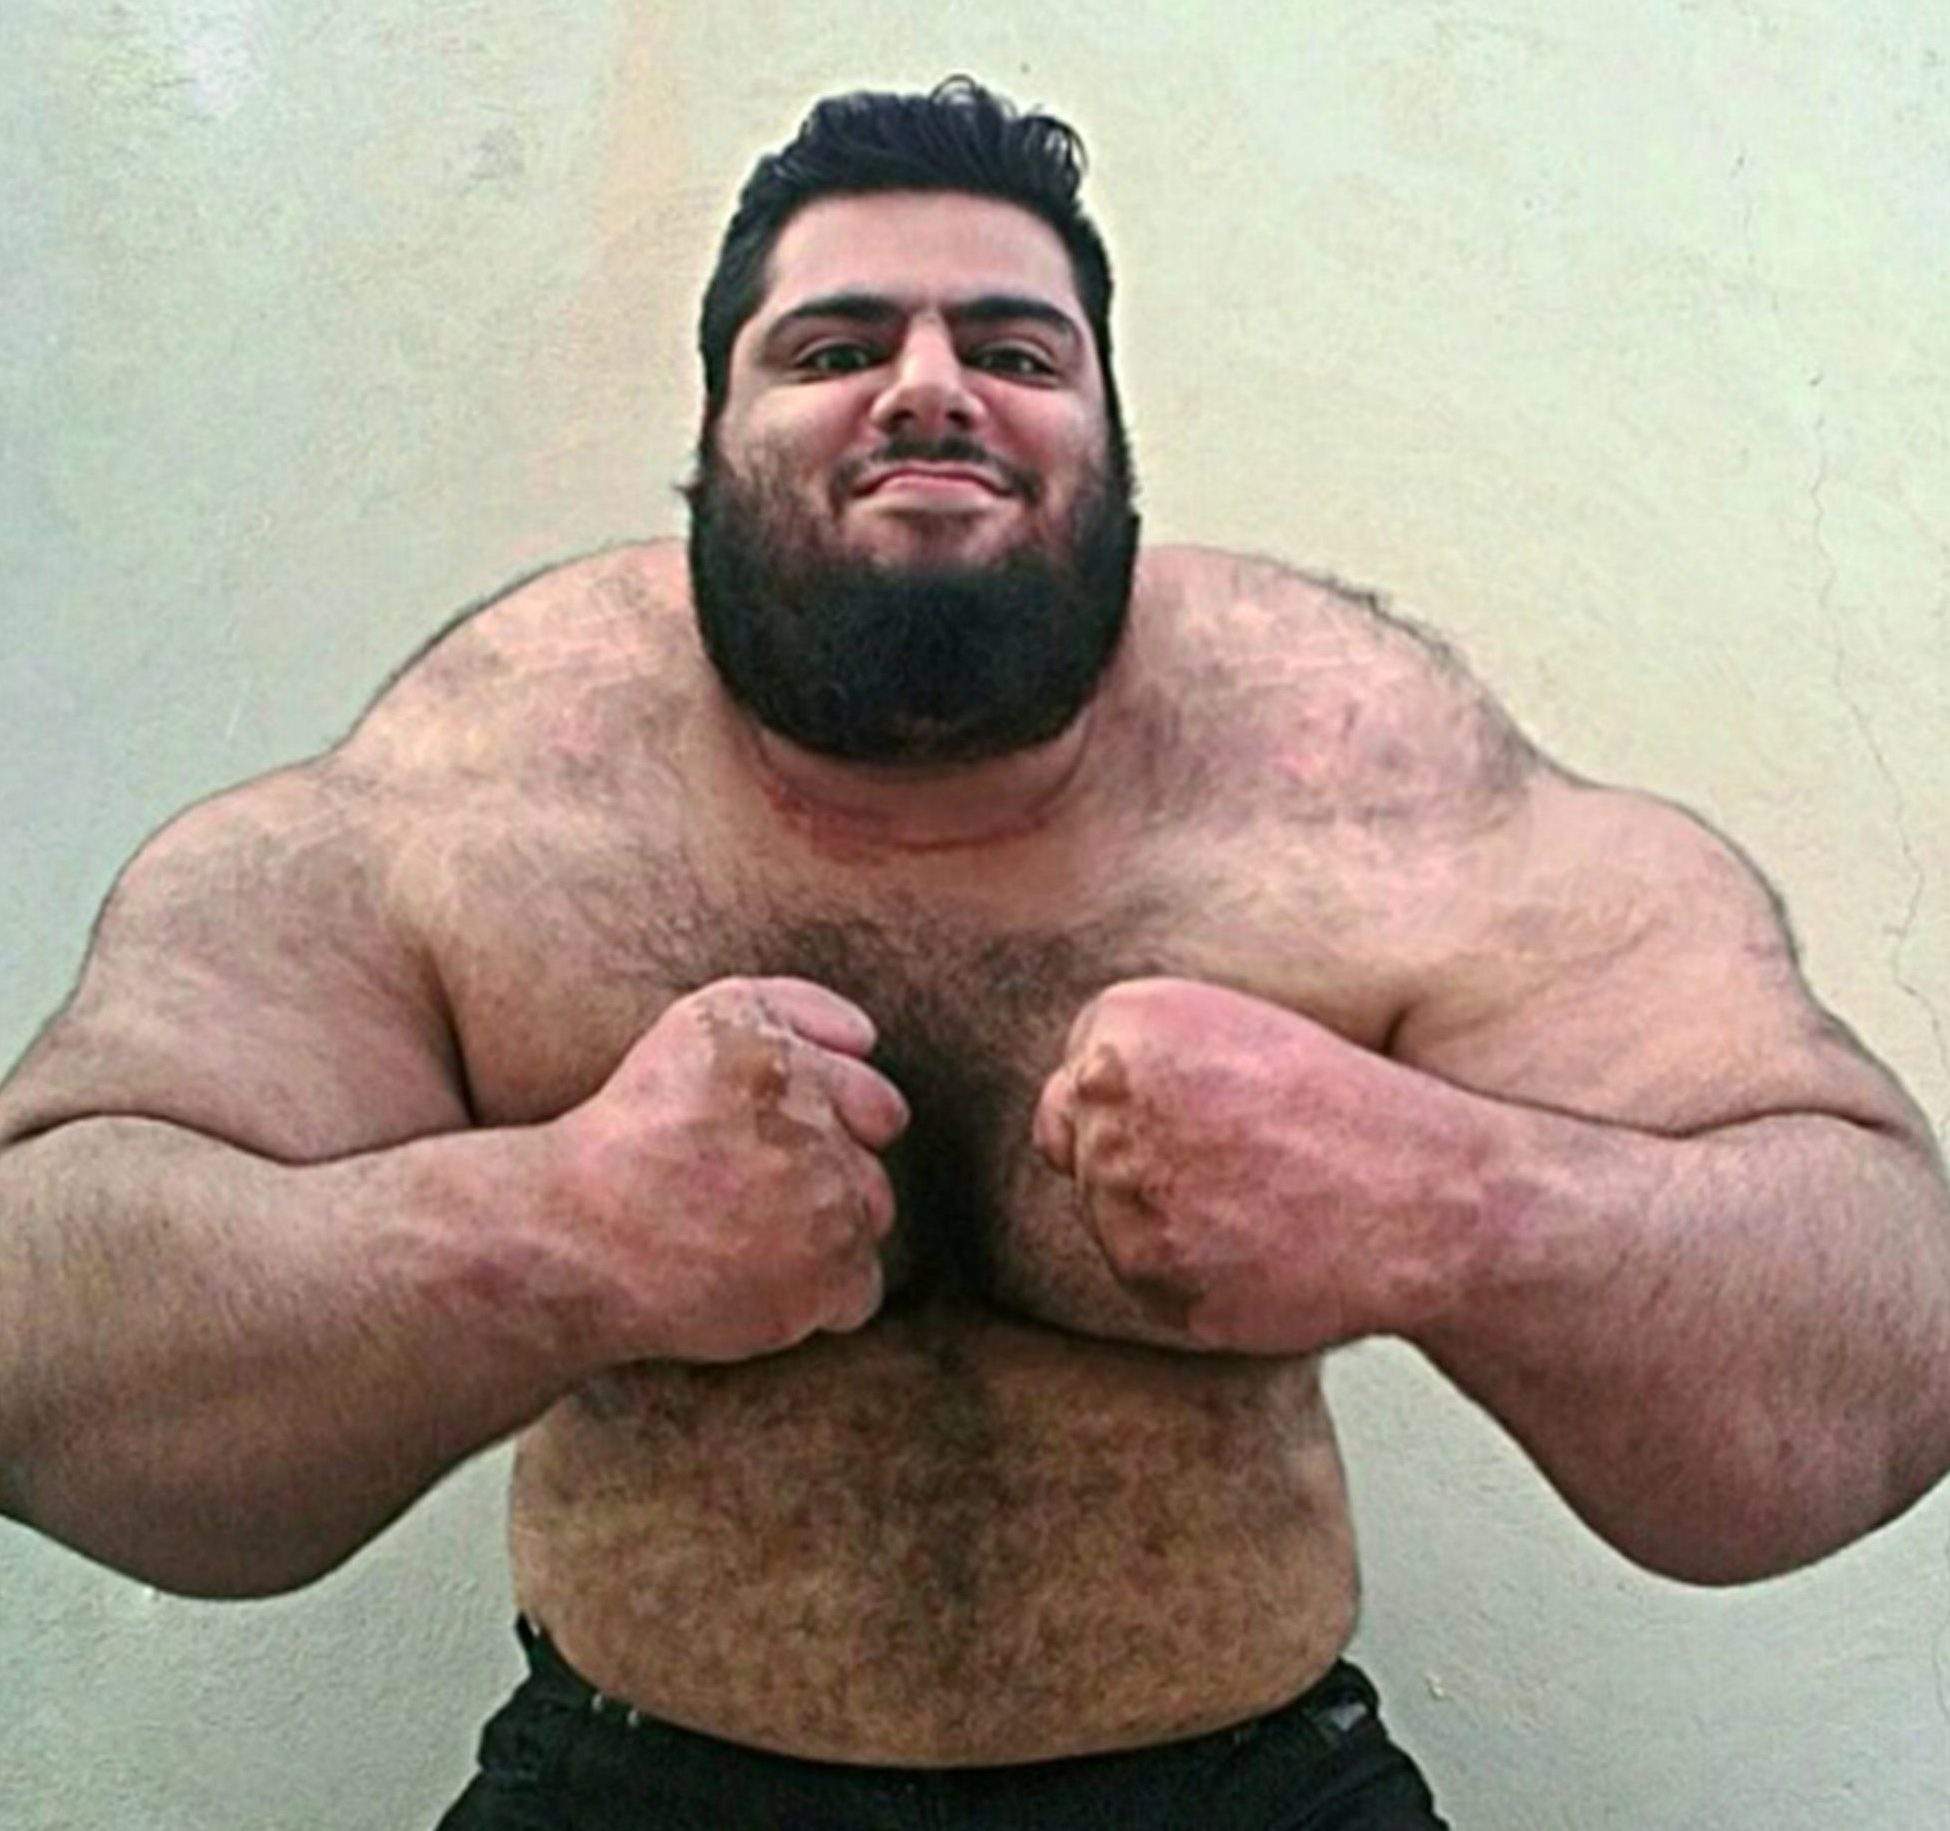 Sajad the 'Iranian Hulk' signs up to take on Isis